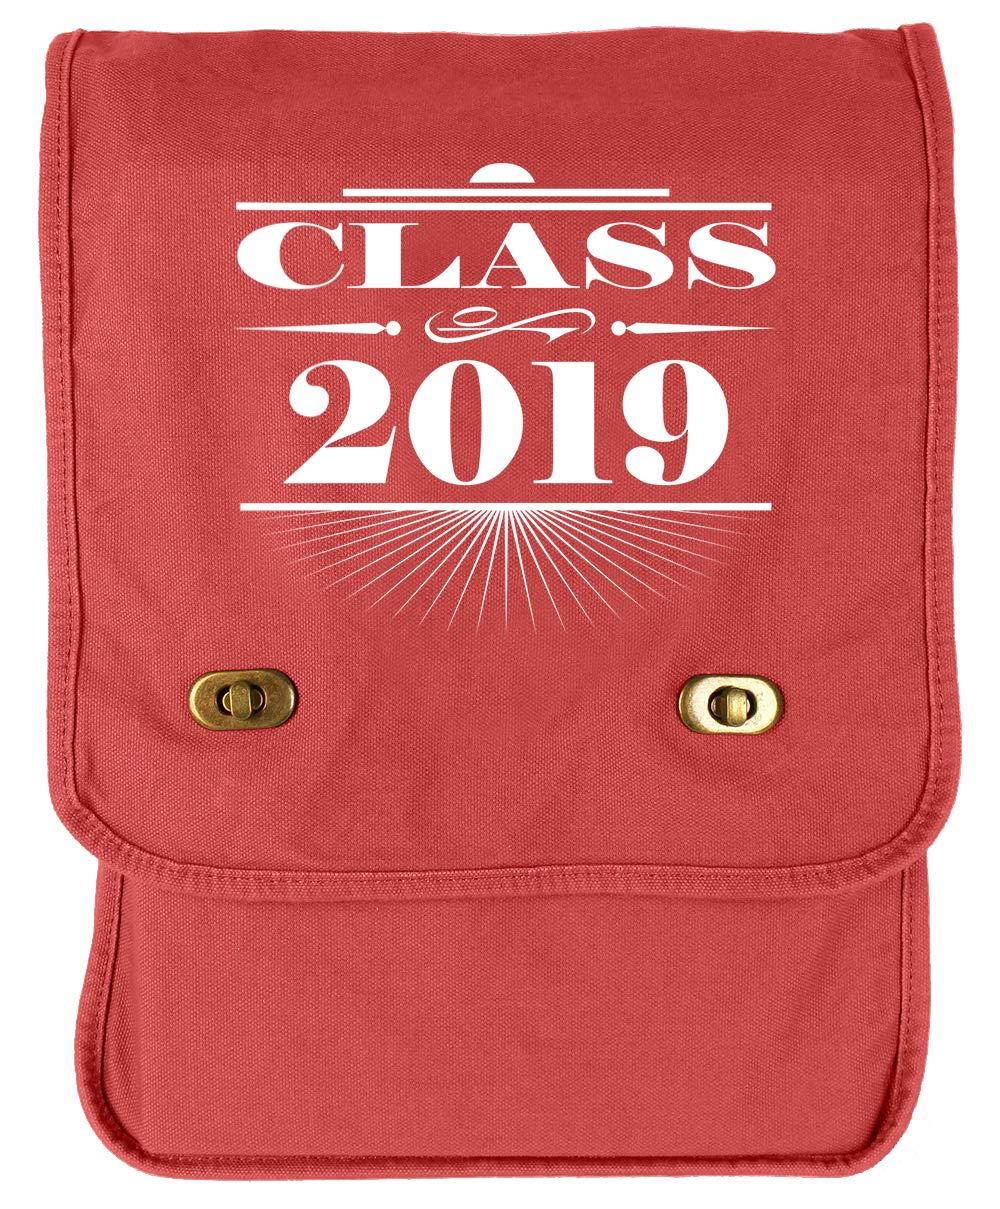 Tenacitee Art Deco Class of 2019 Khaki Green Raw Edge Canvas Messenger Bag